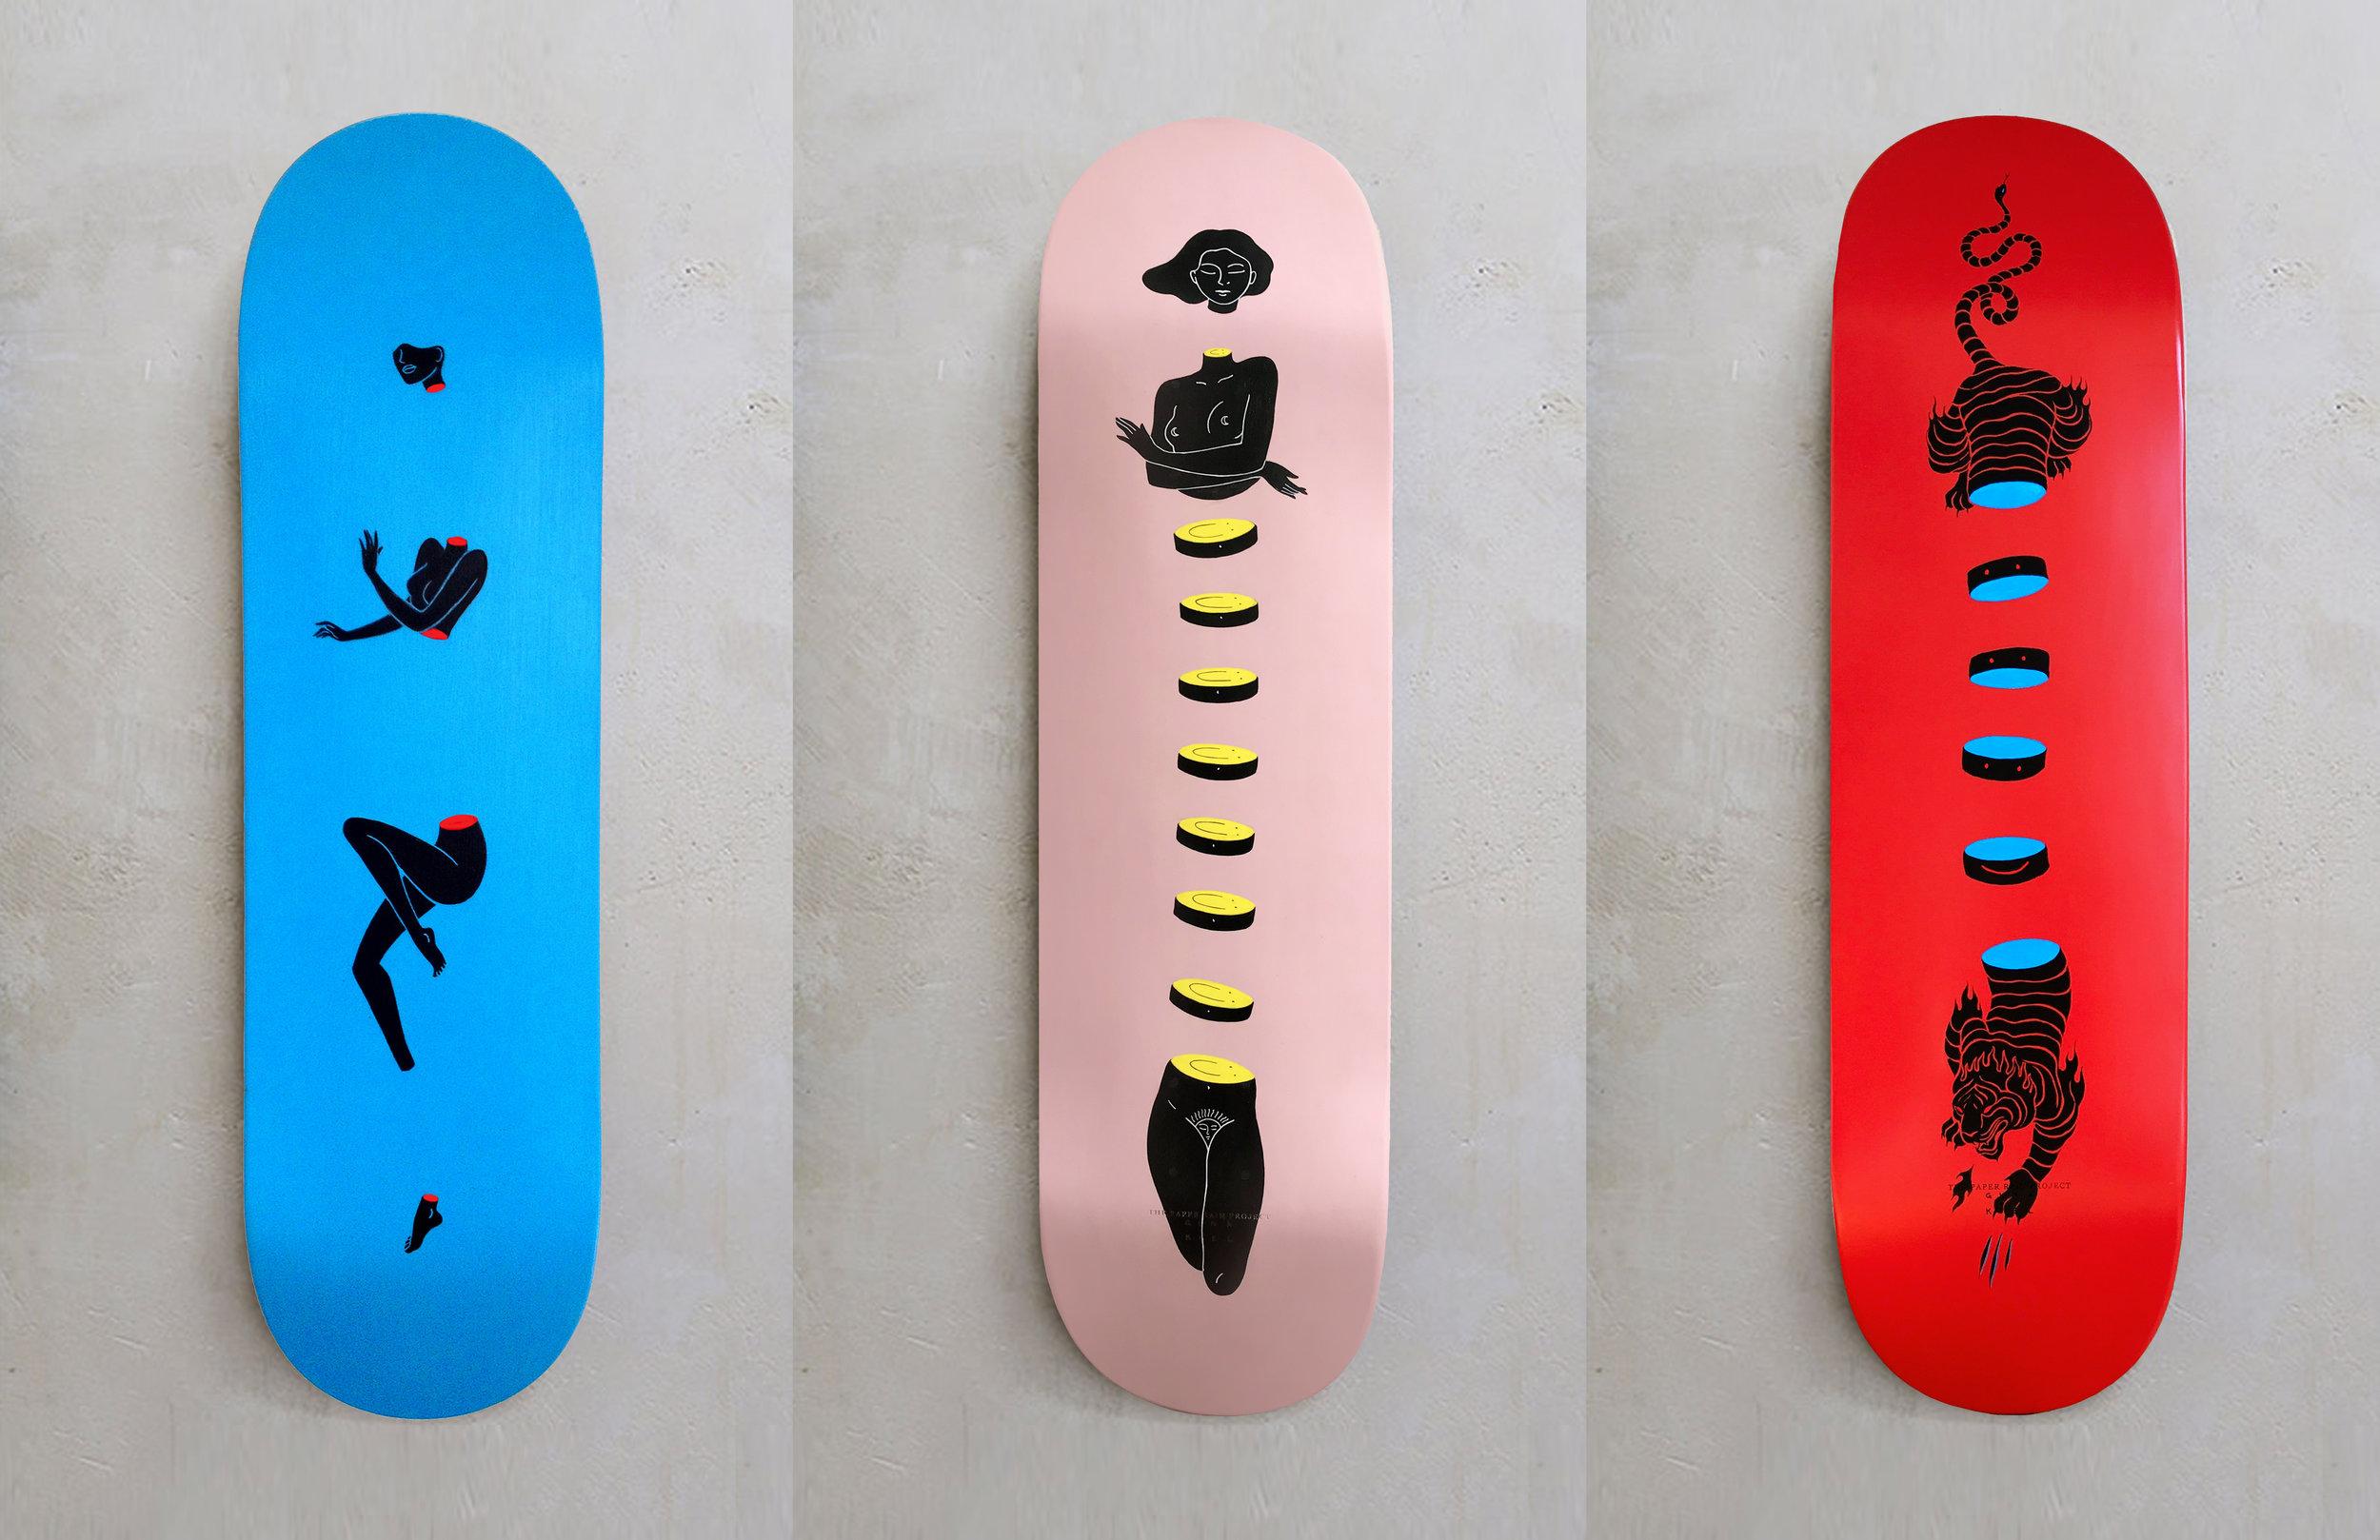 eb8ed49b7b2a Skateboards